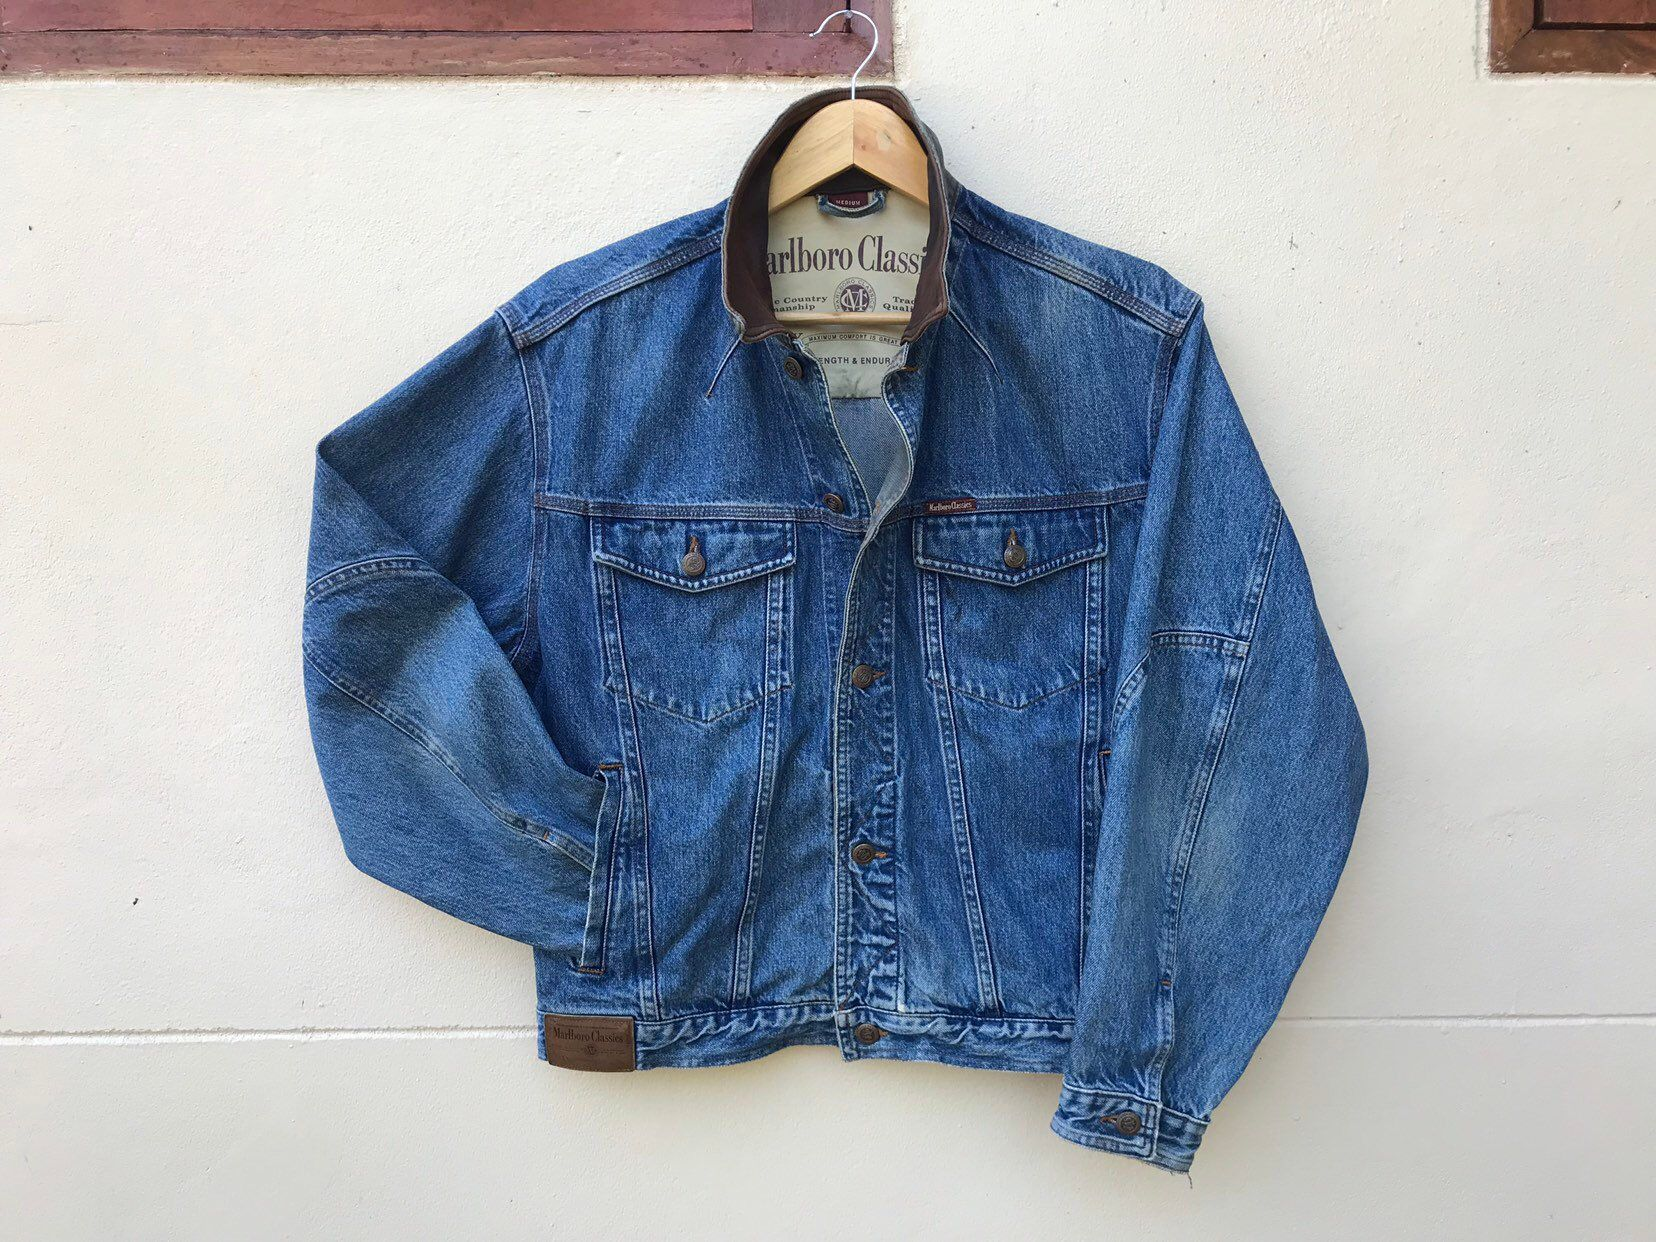 Marlboro Classics Denim Jacket 90s Vintage Workwear Size M Etsy 90s Vintage Jackets Trucker Coat Vintage Jacket